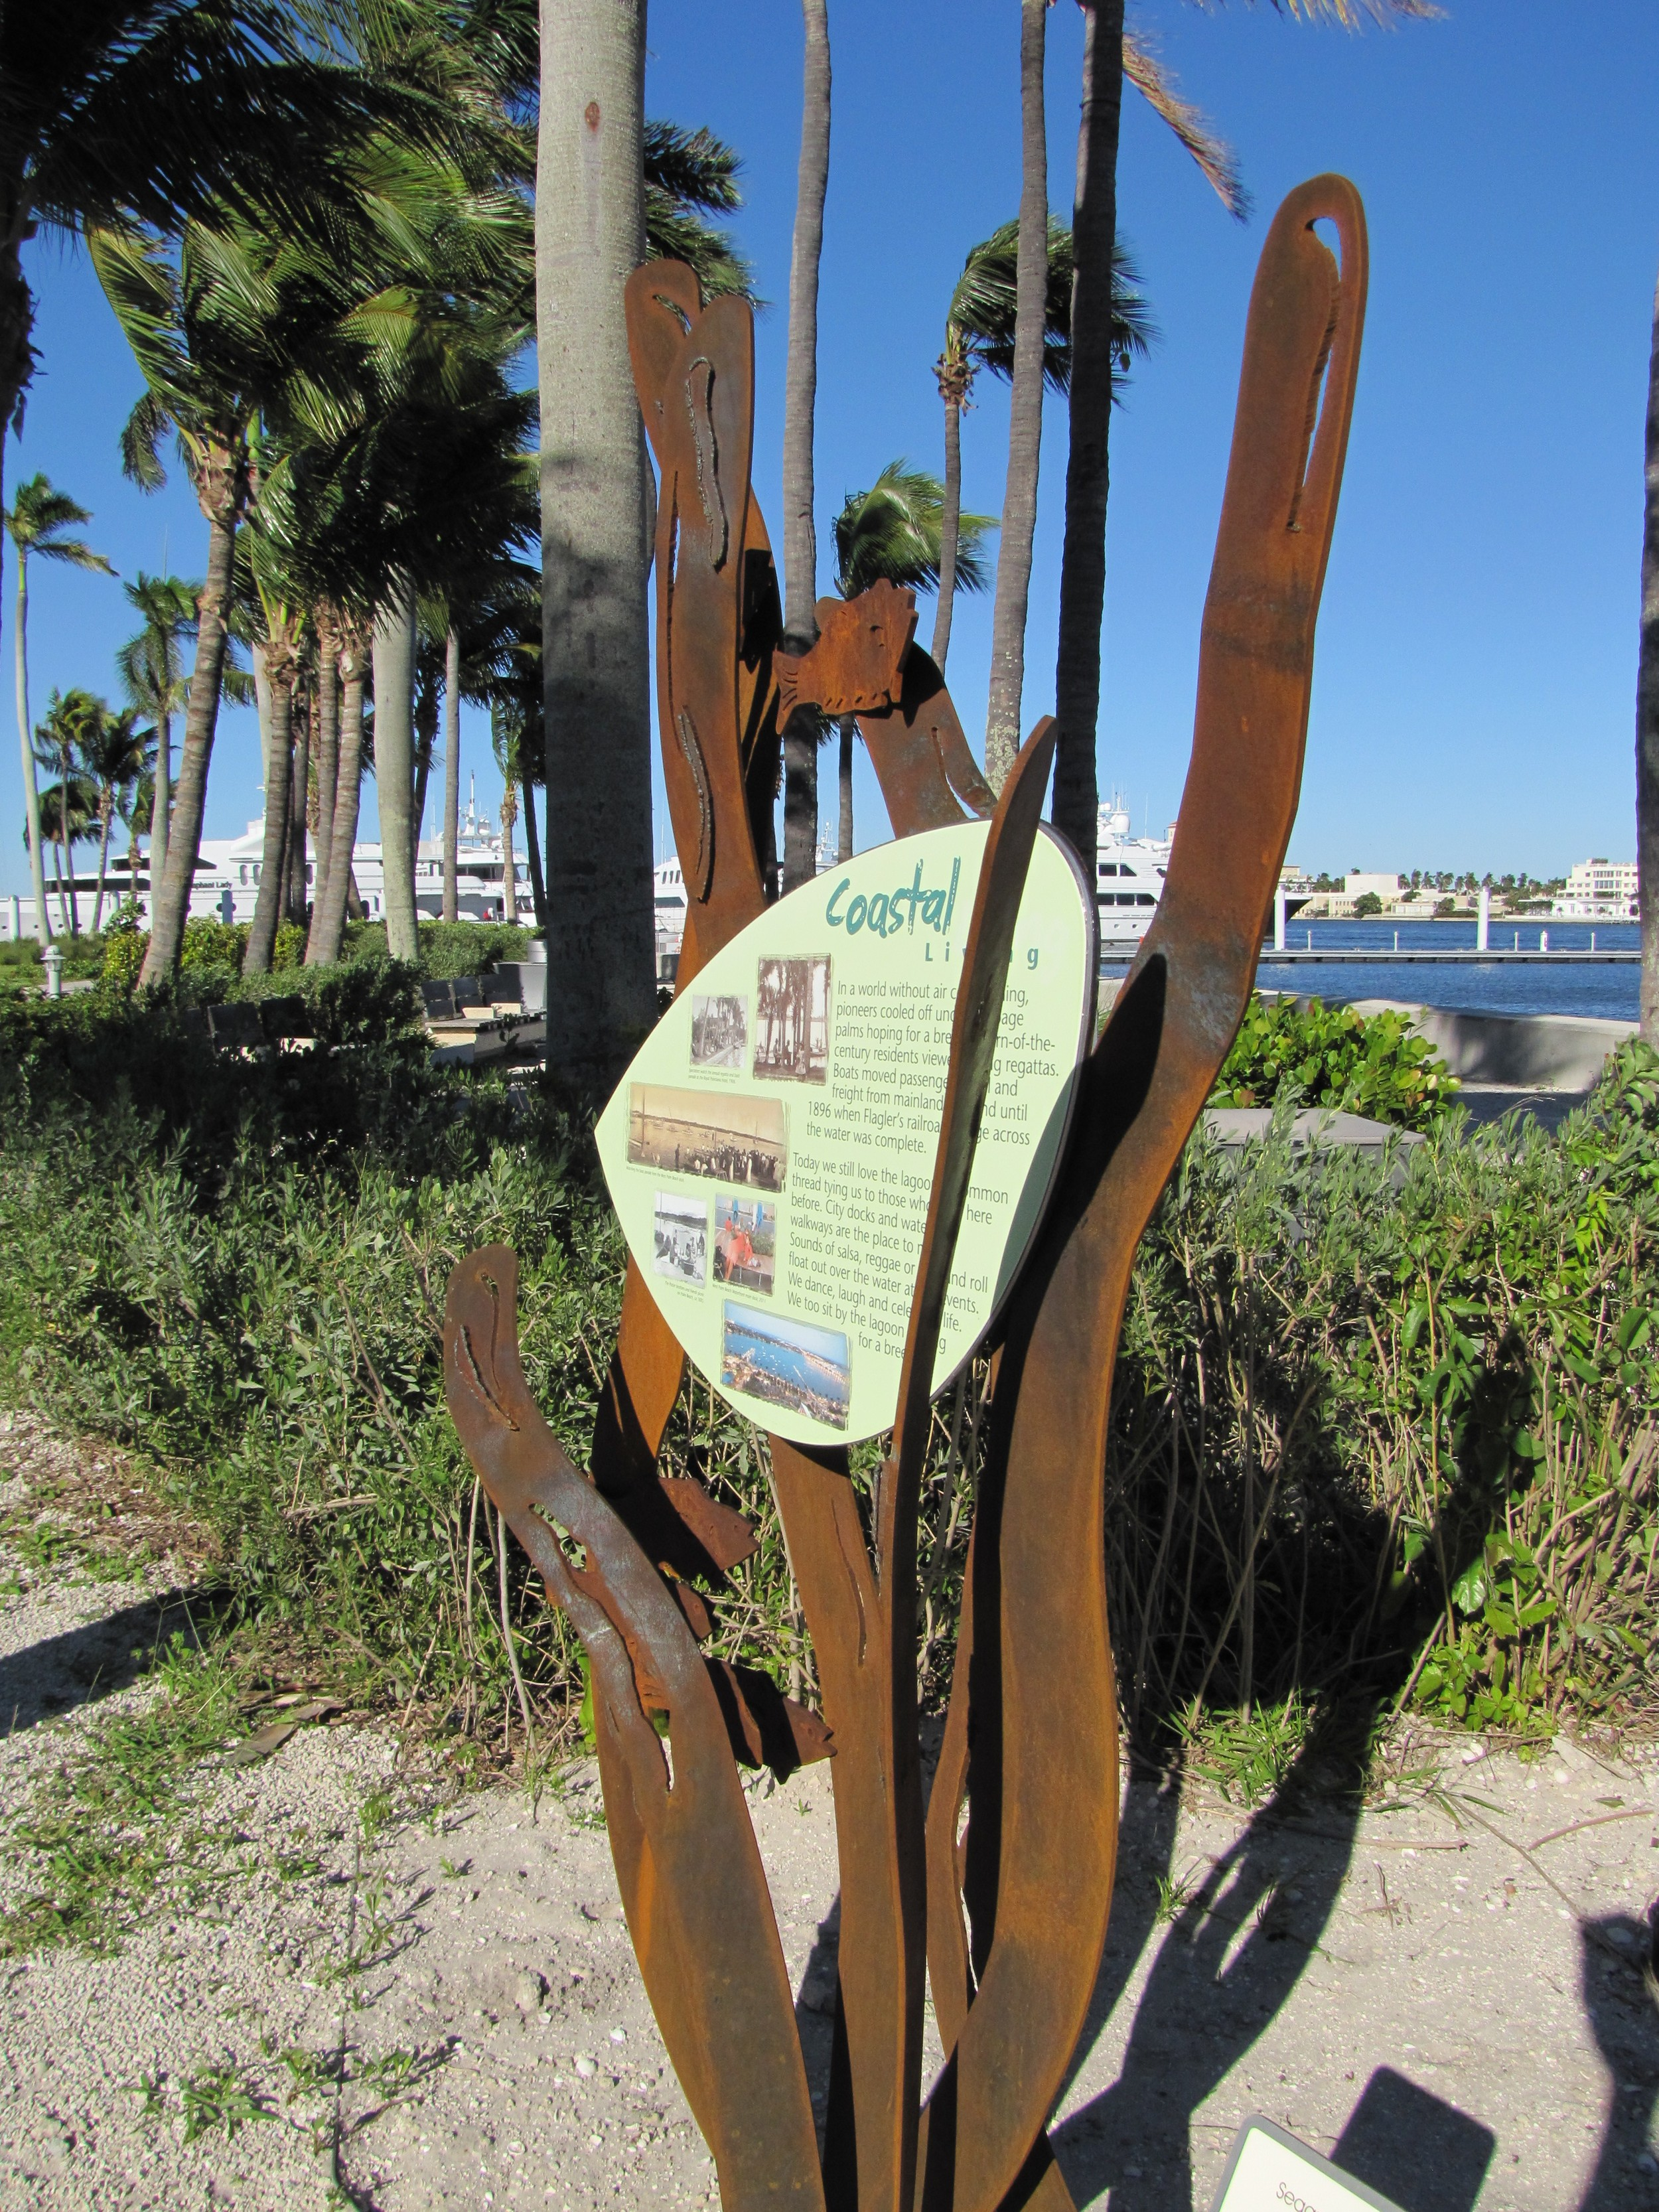 West Palm Beach Waterfront Interpretive Signage